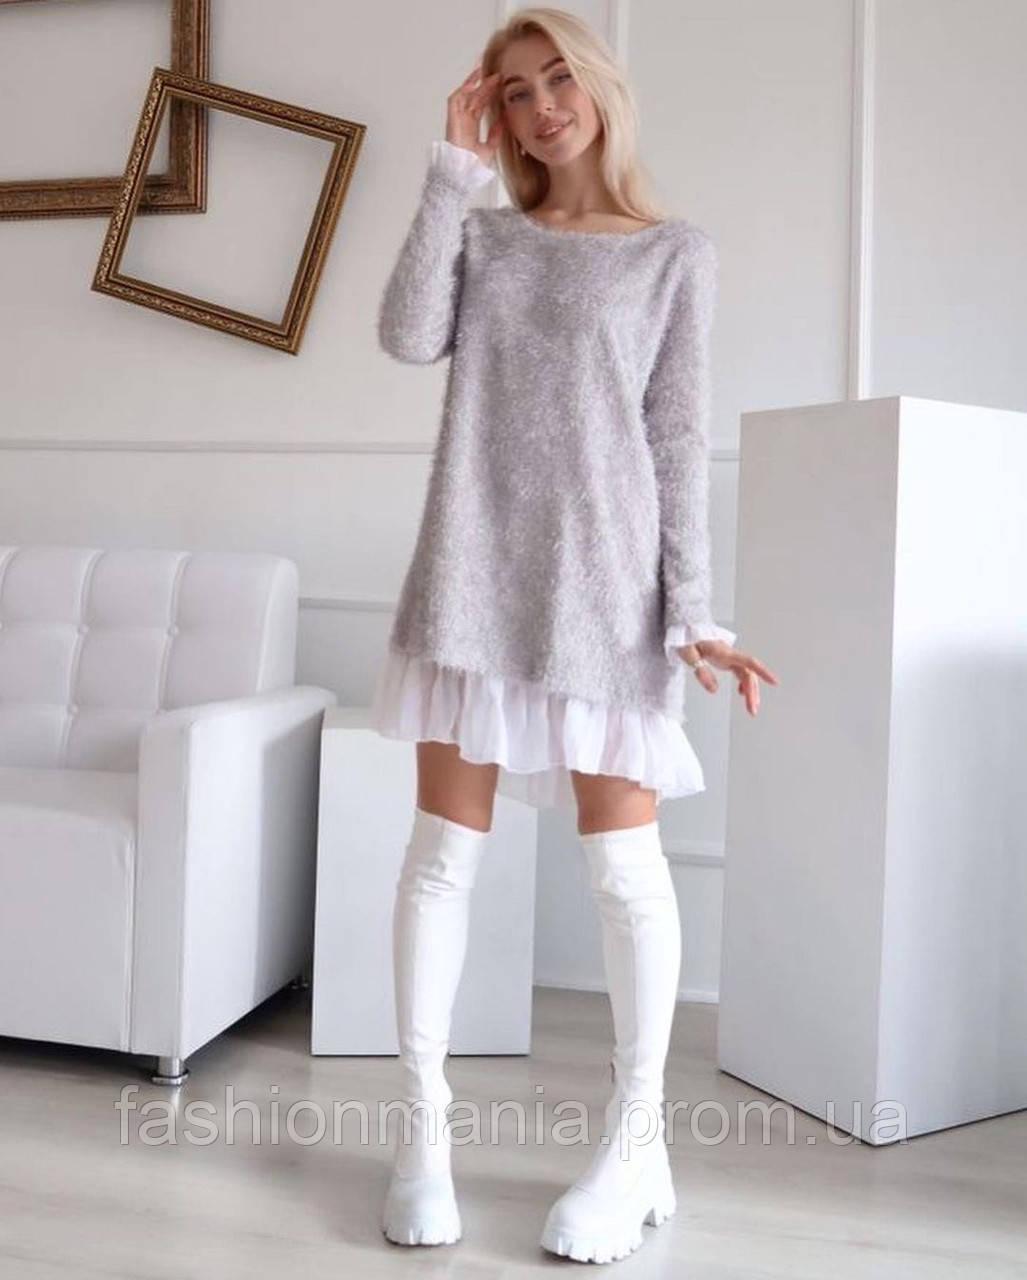 Платье женское Ангора травка серый, чёрный, бежевый